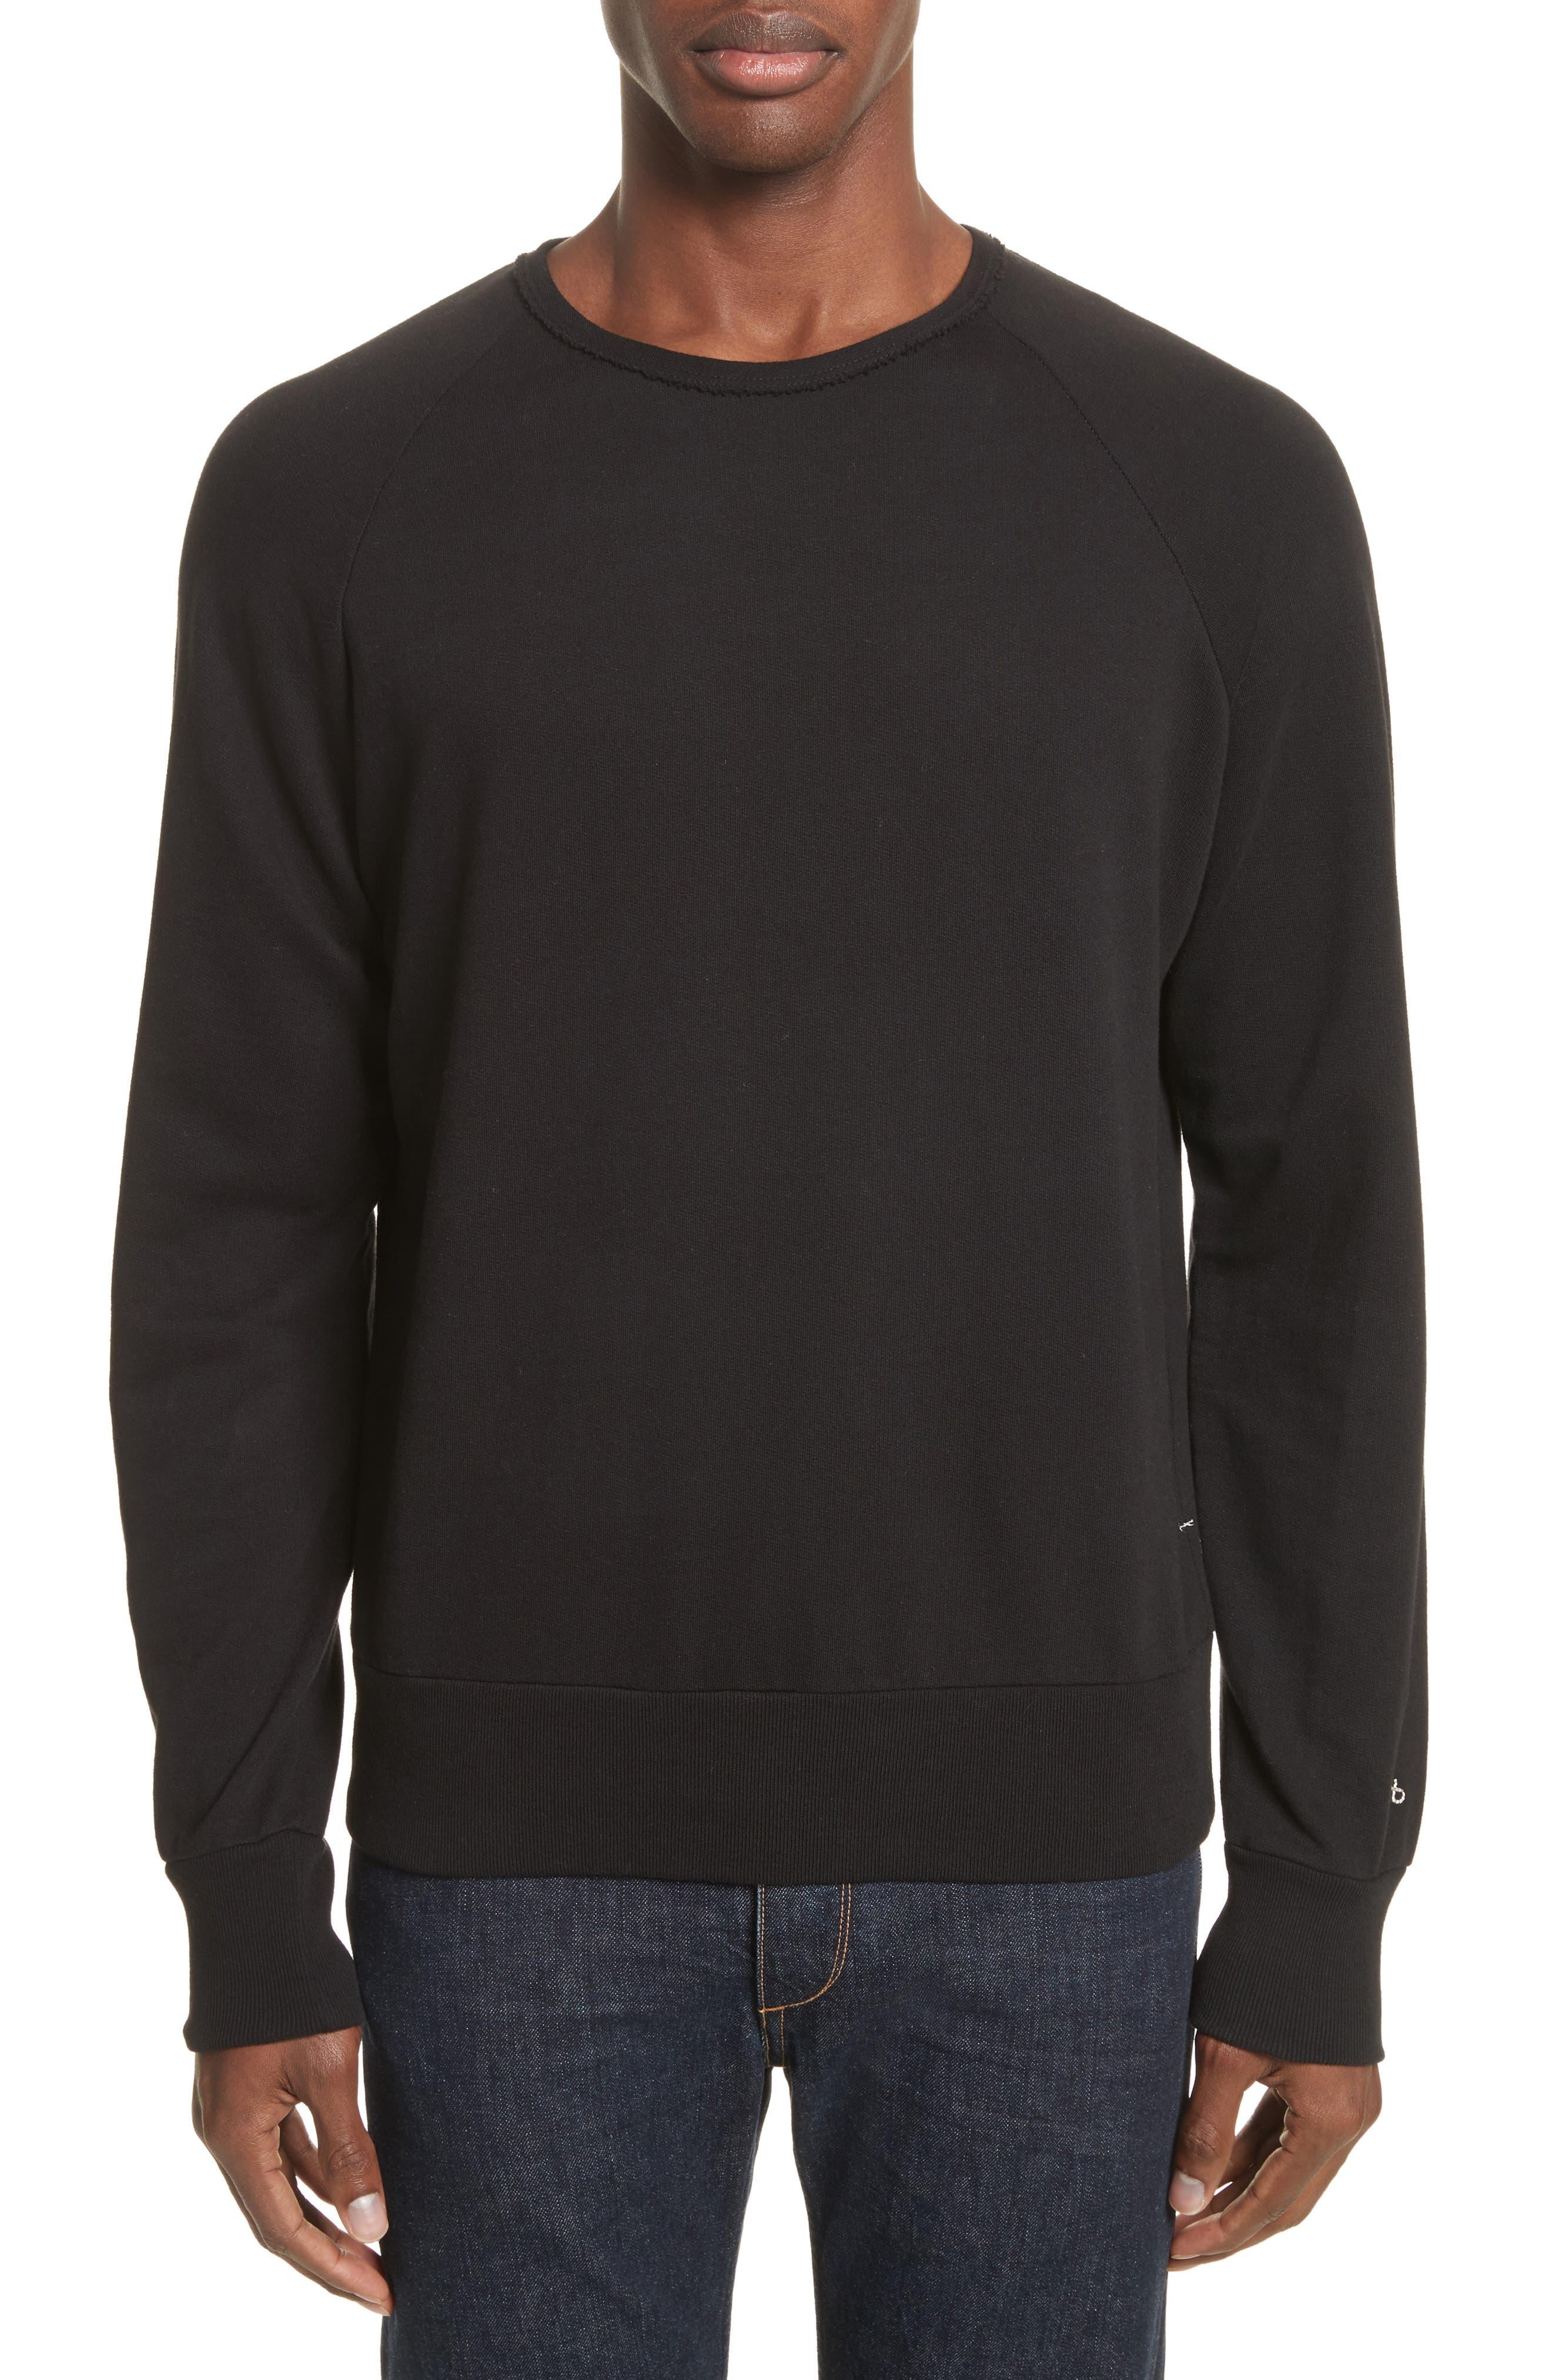 Standard Issue Crewneck Sweatshirt,                         Main,                         color, 001